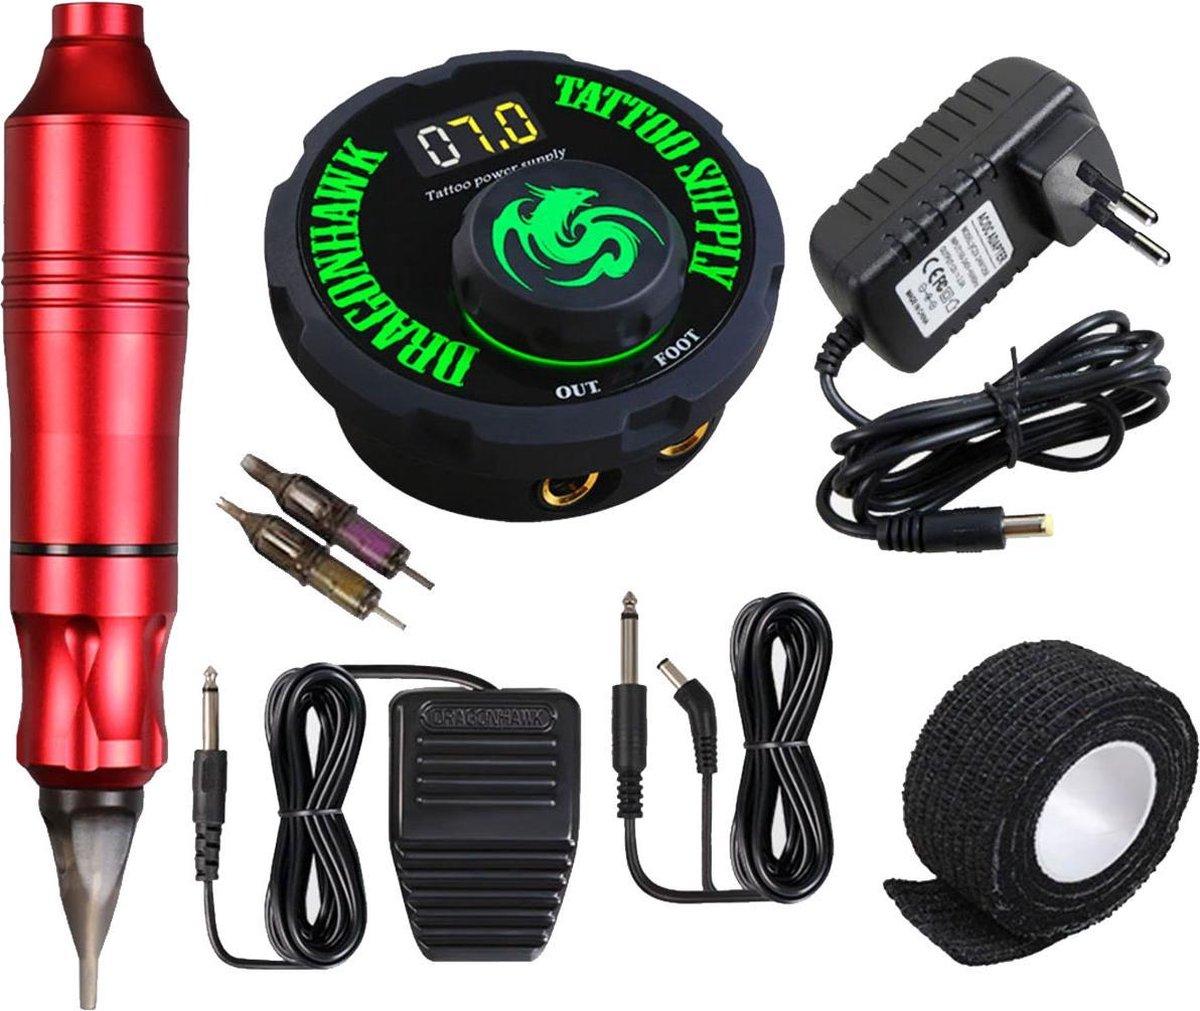 Dragonhawk Professionele Rotary Tattoo Machine - Complete set met power supply en naalden